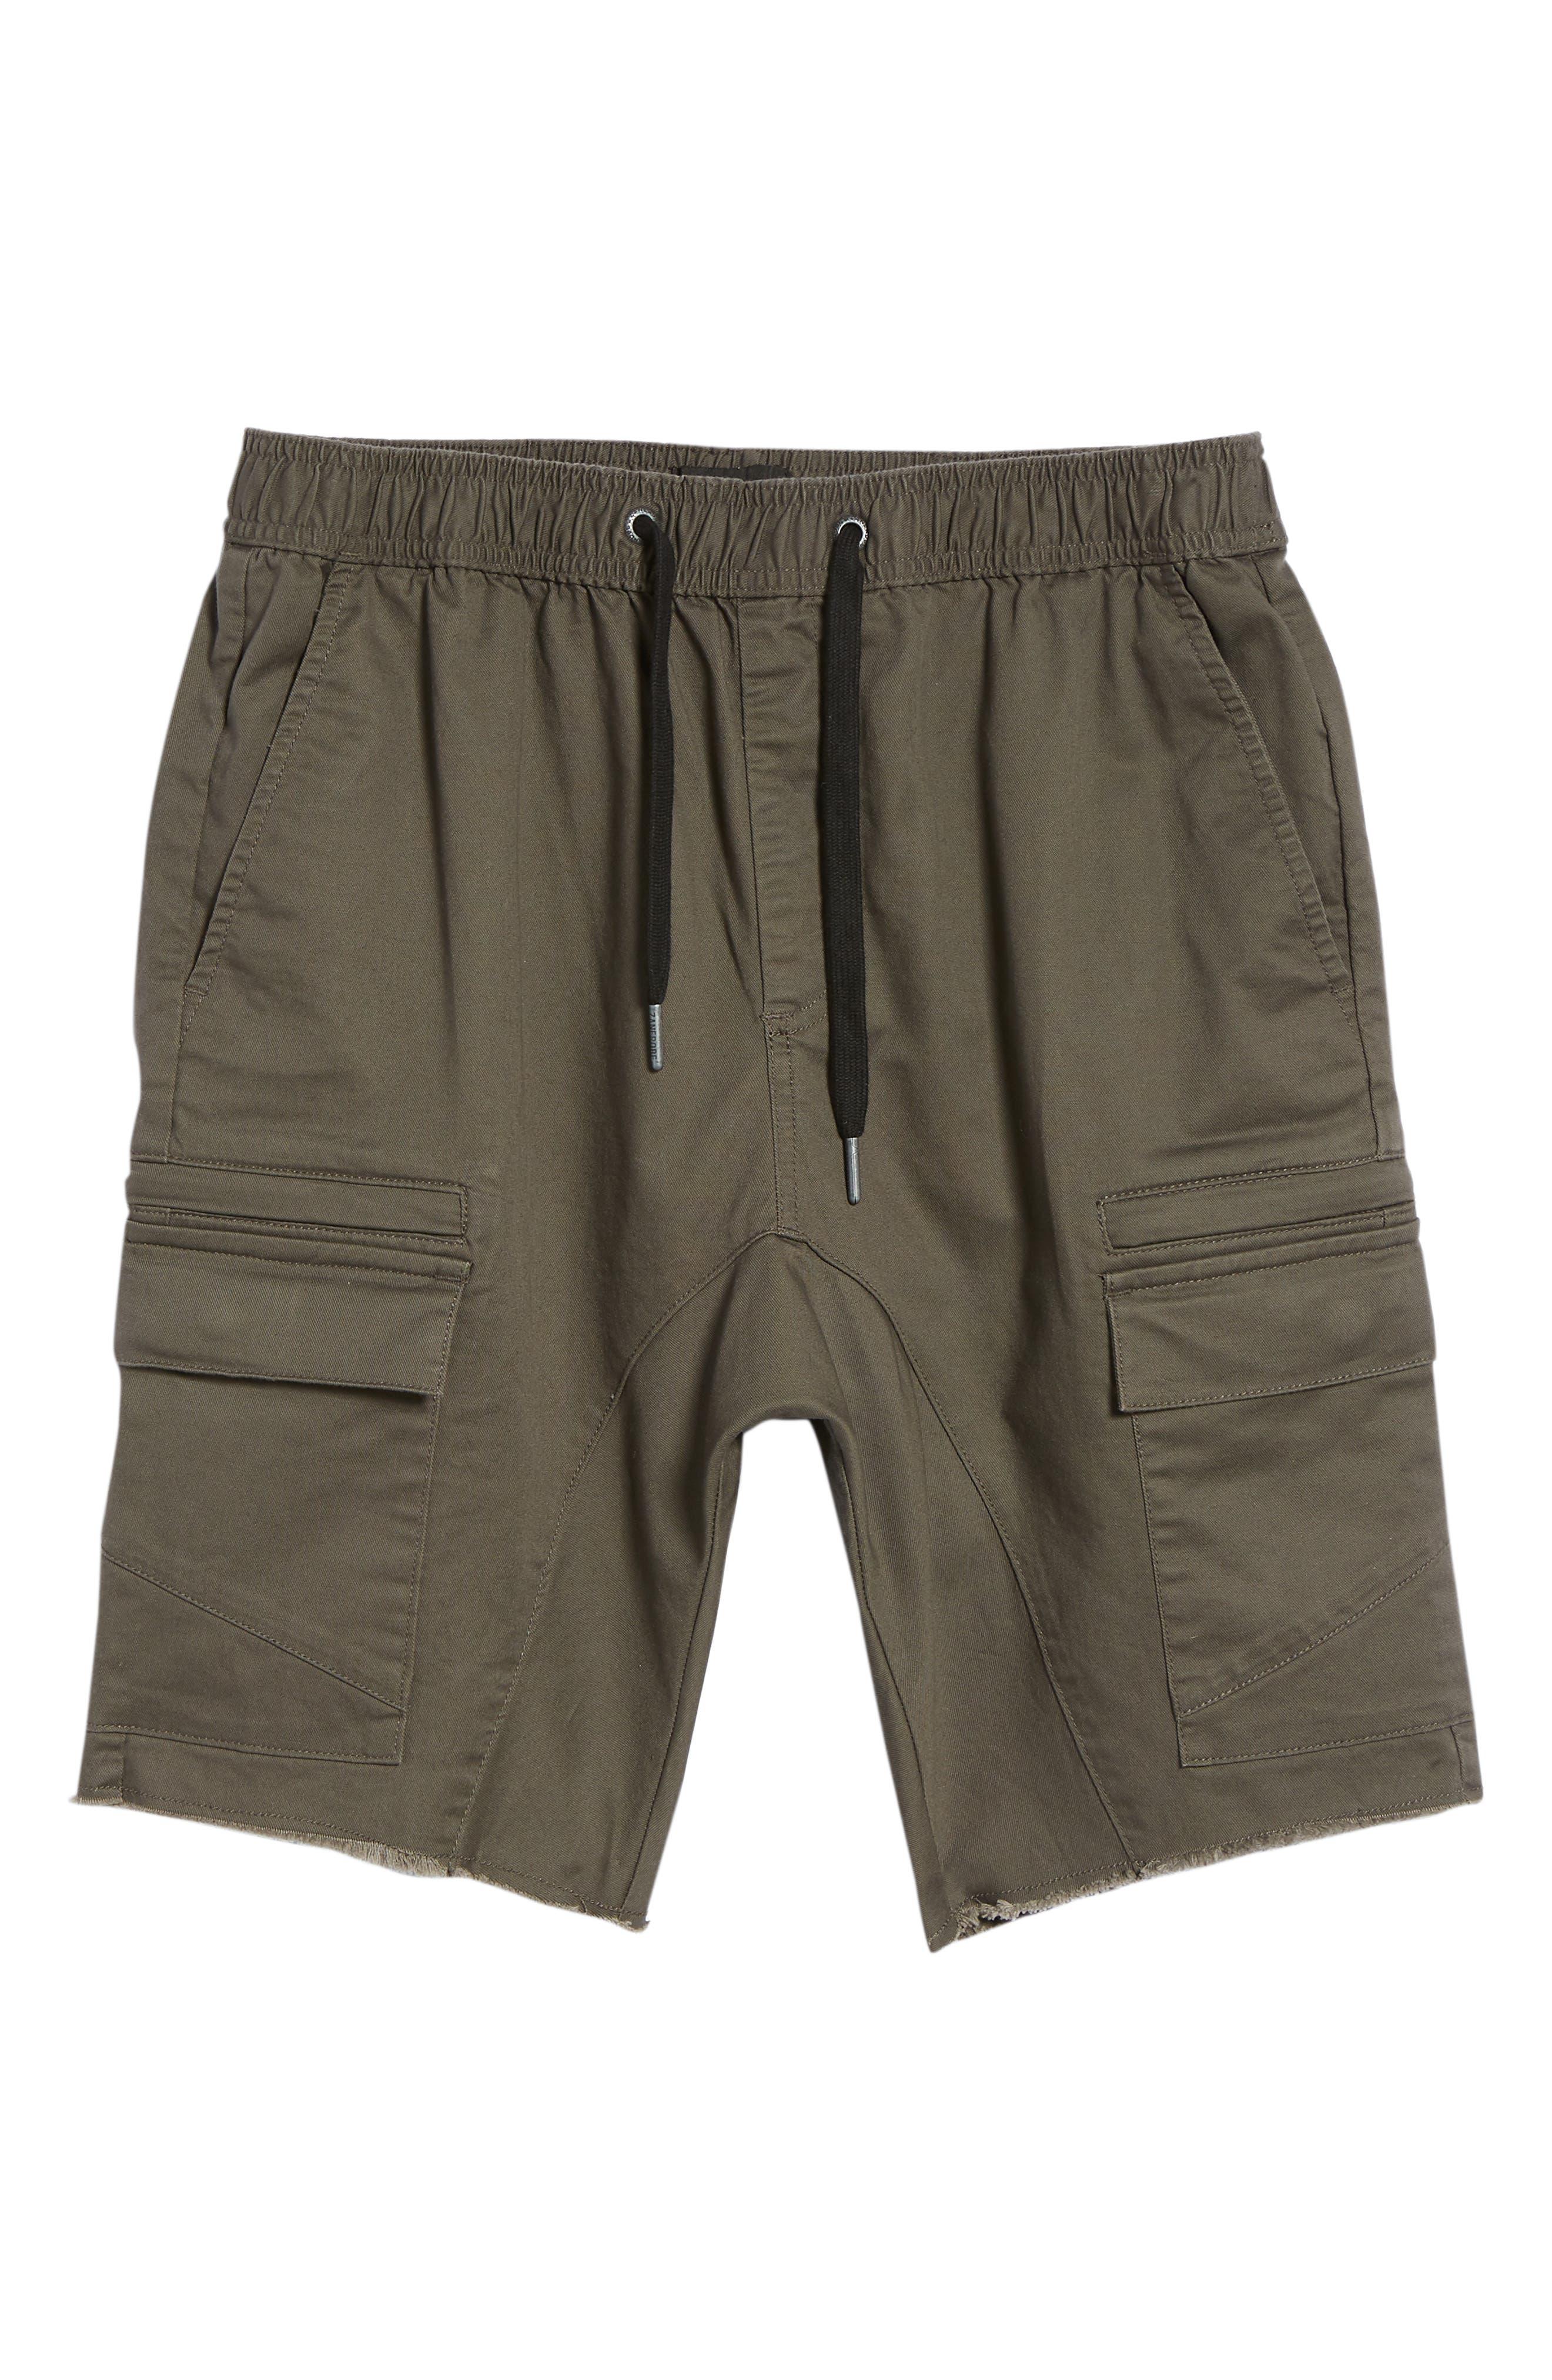 Sureshot Cargo Shorts,                             Alternate thumbnail 6, color,                             Peat